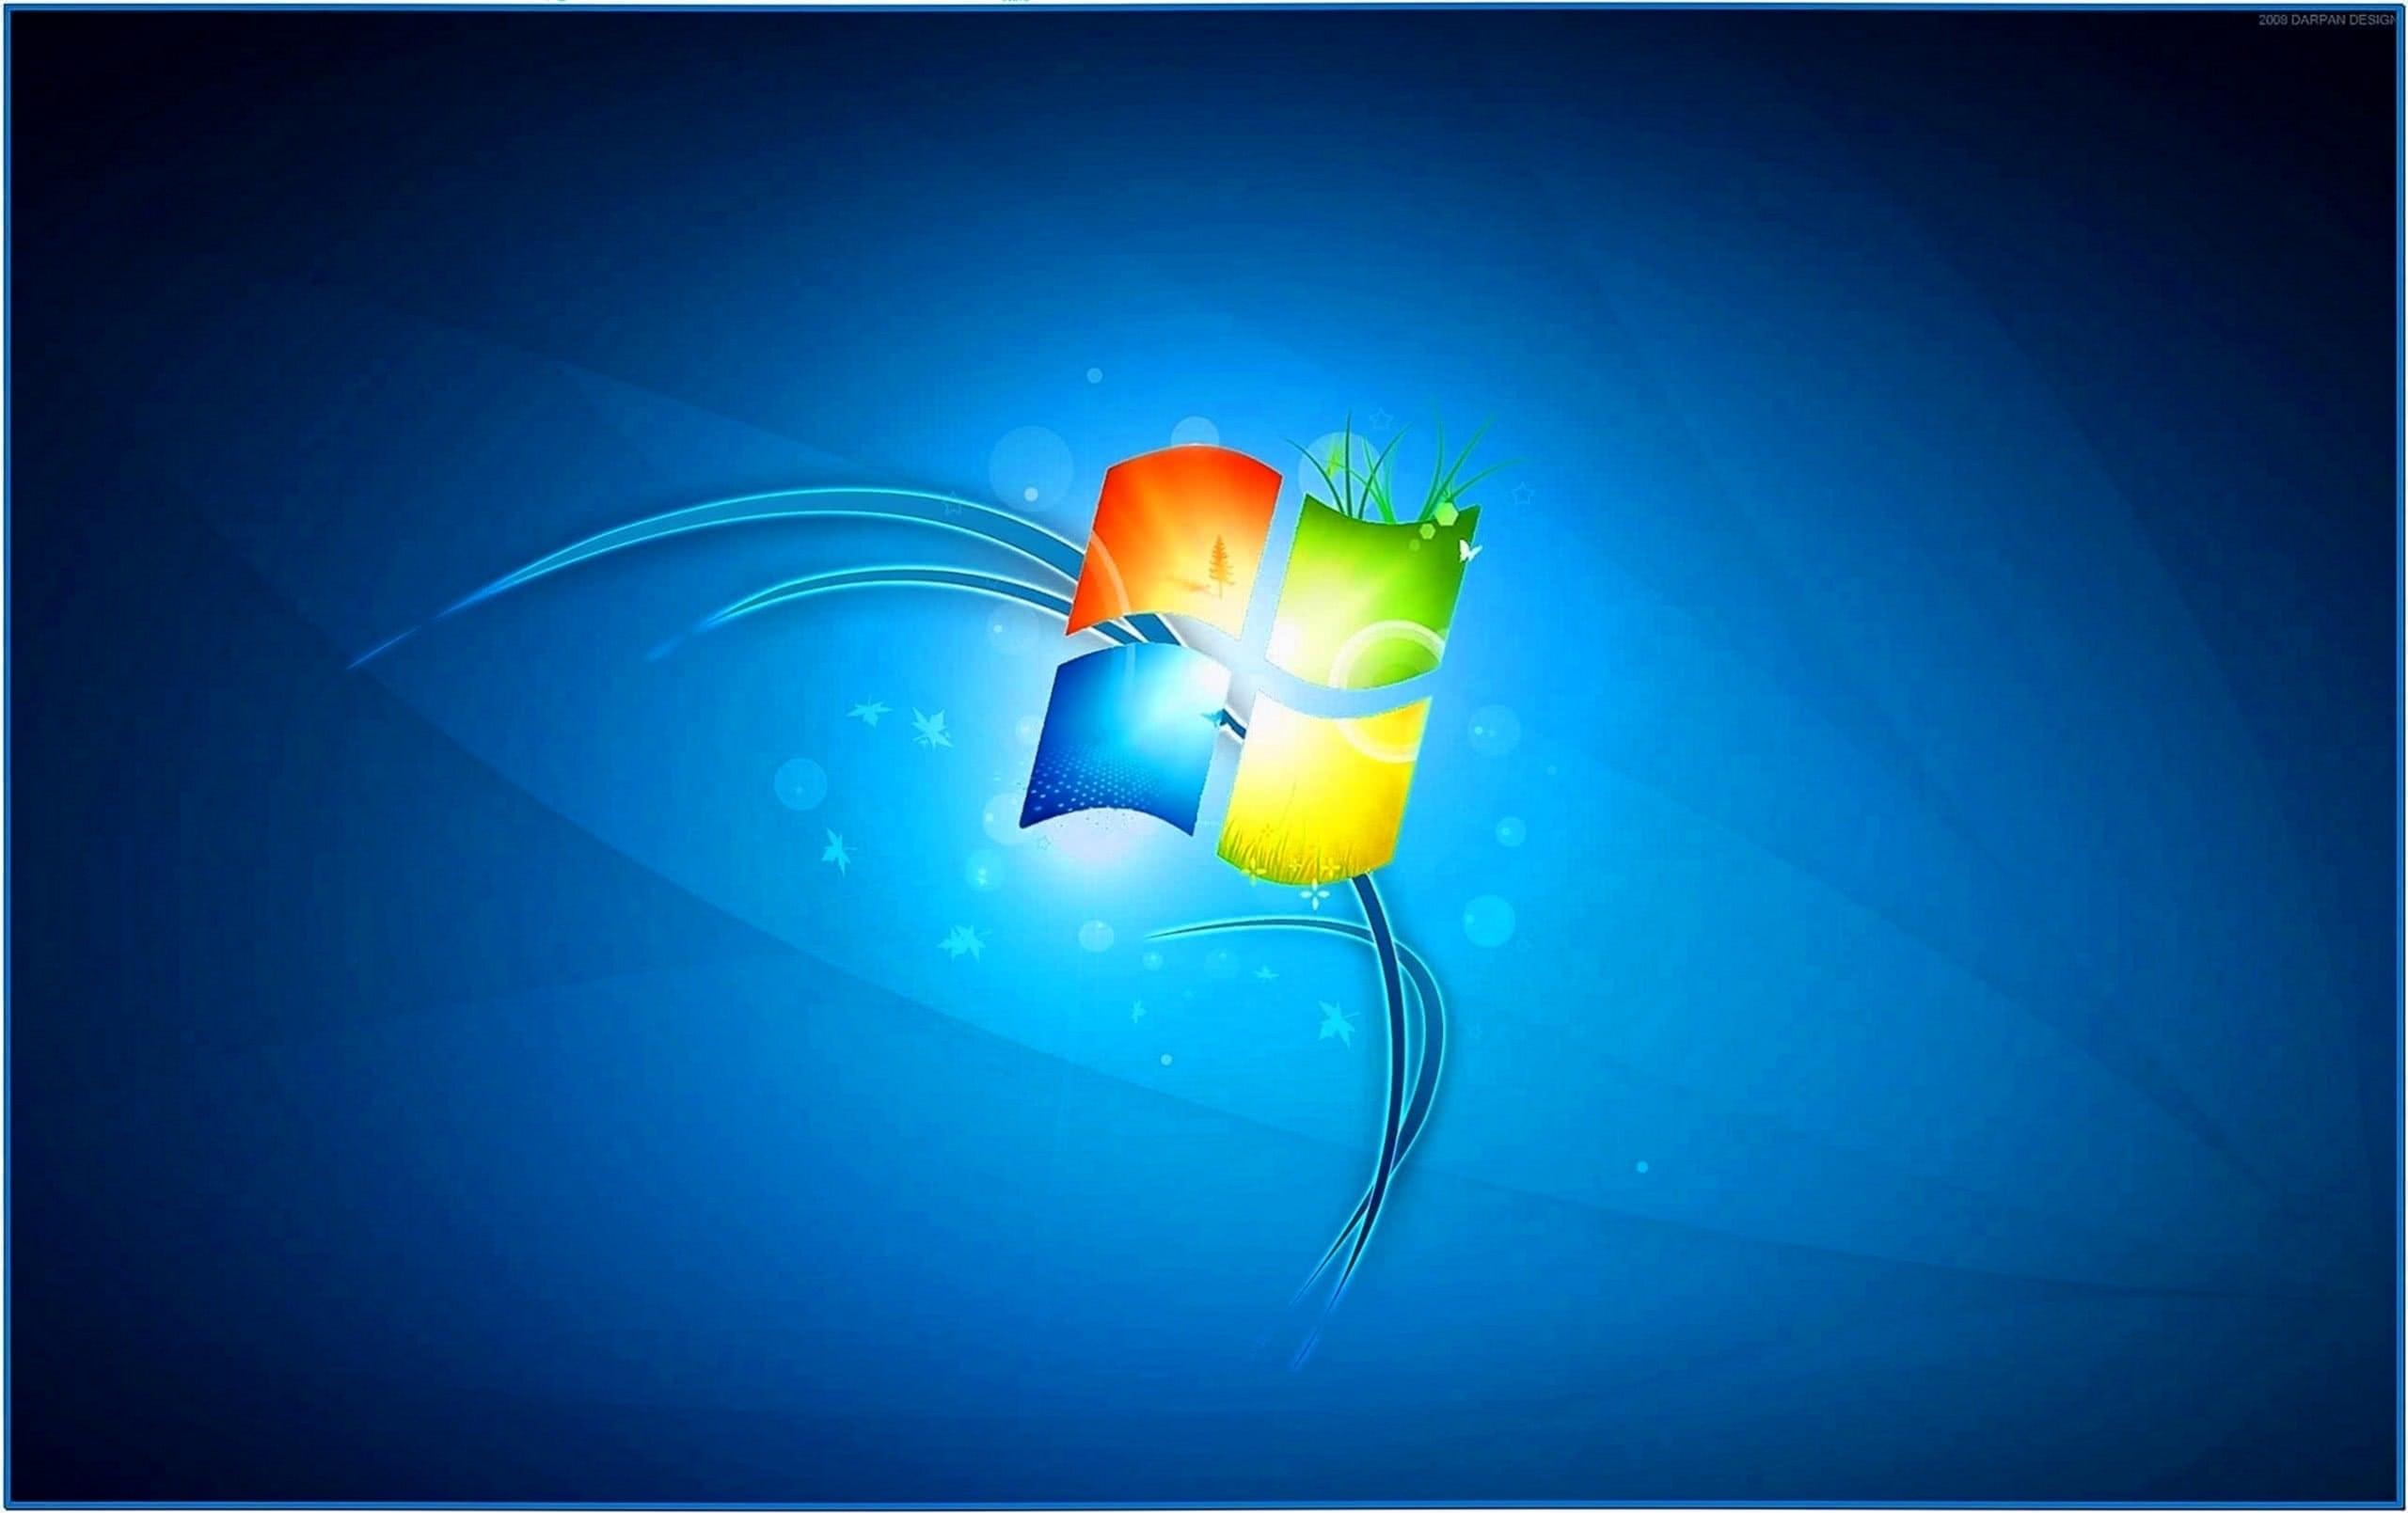 3D Screensavers Windows 7 Ultimate